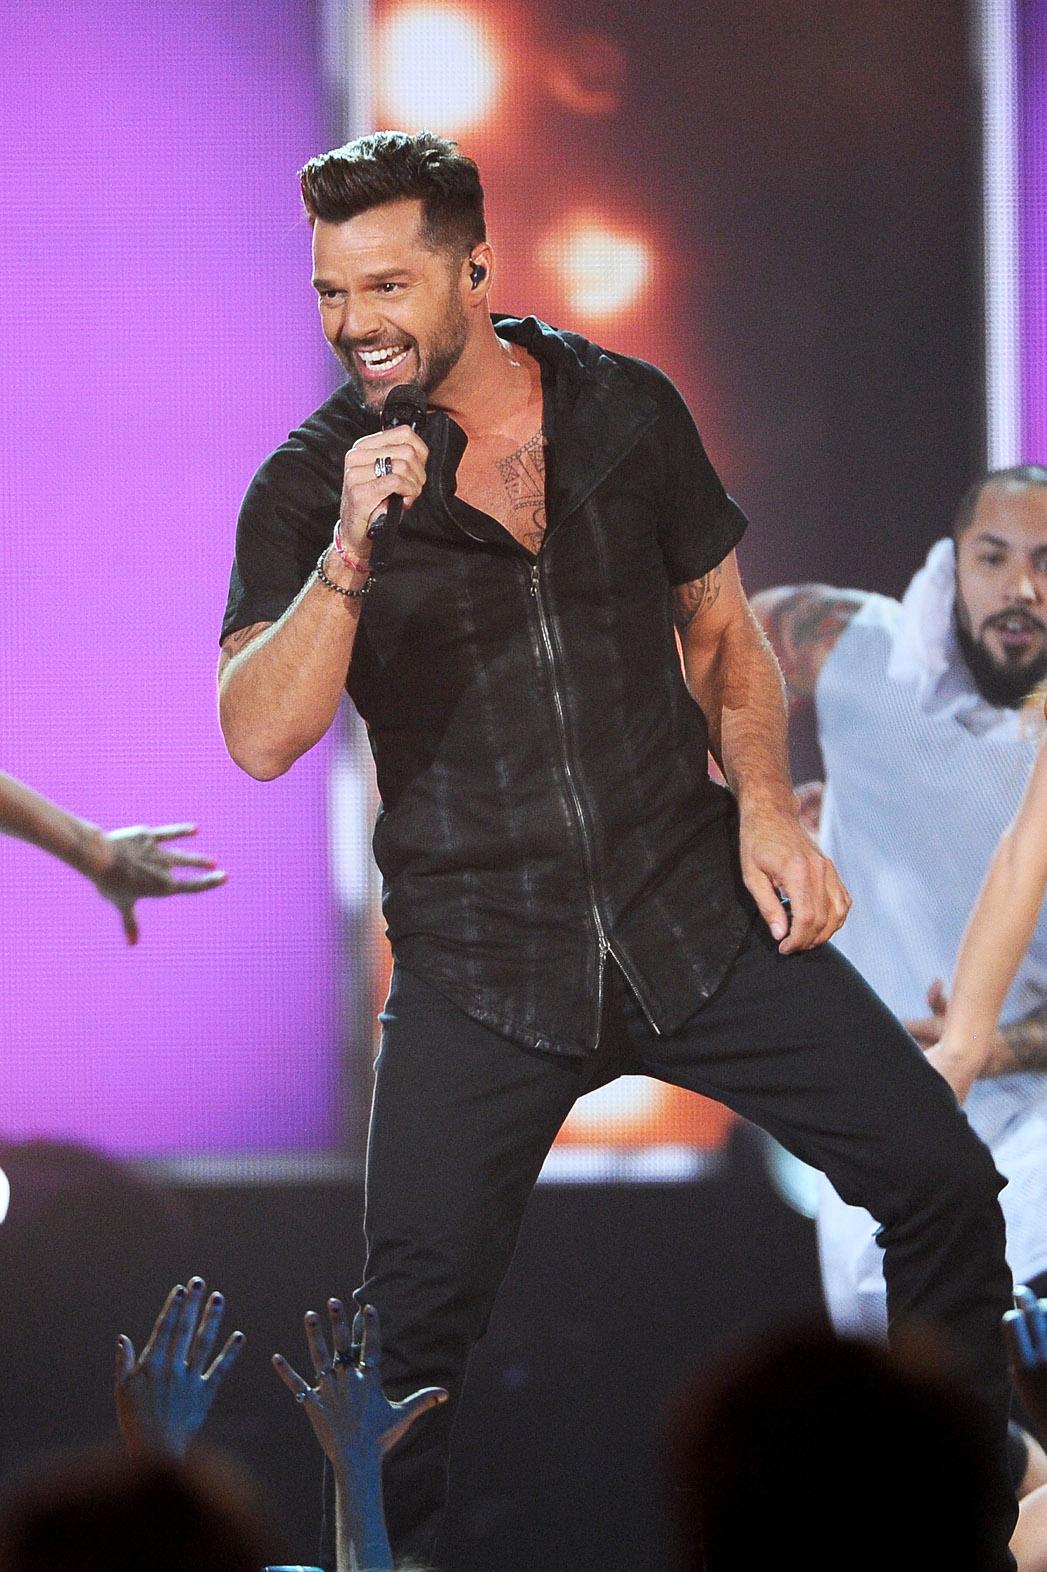 Ricky Martin Billboard Music Awards Performance - P 2014